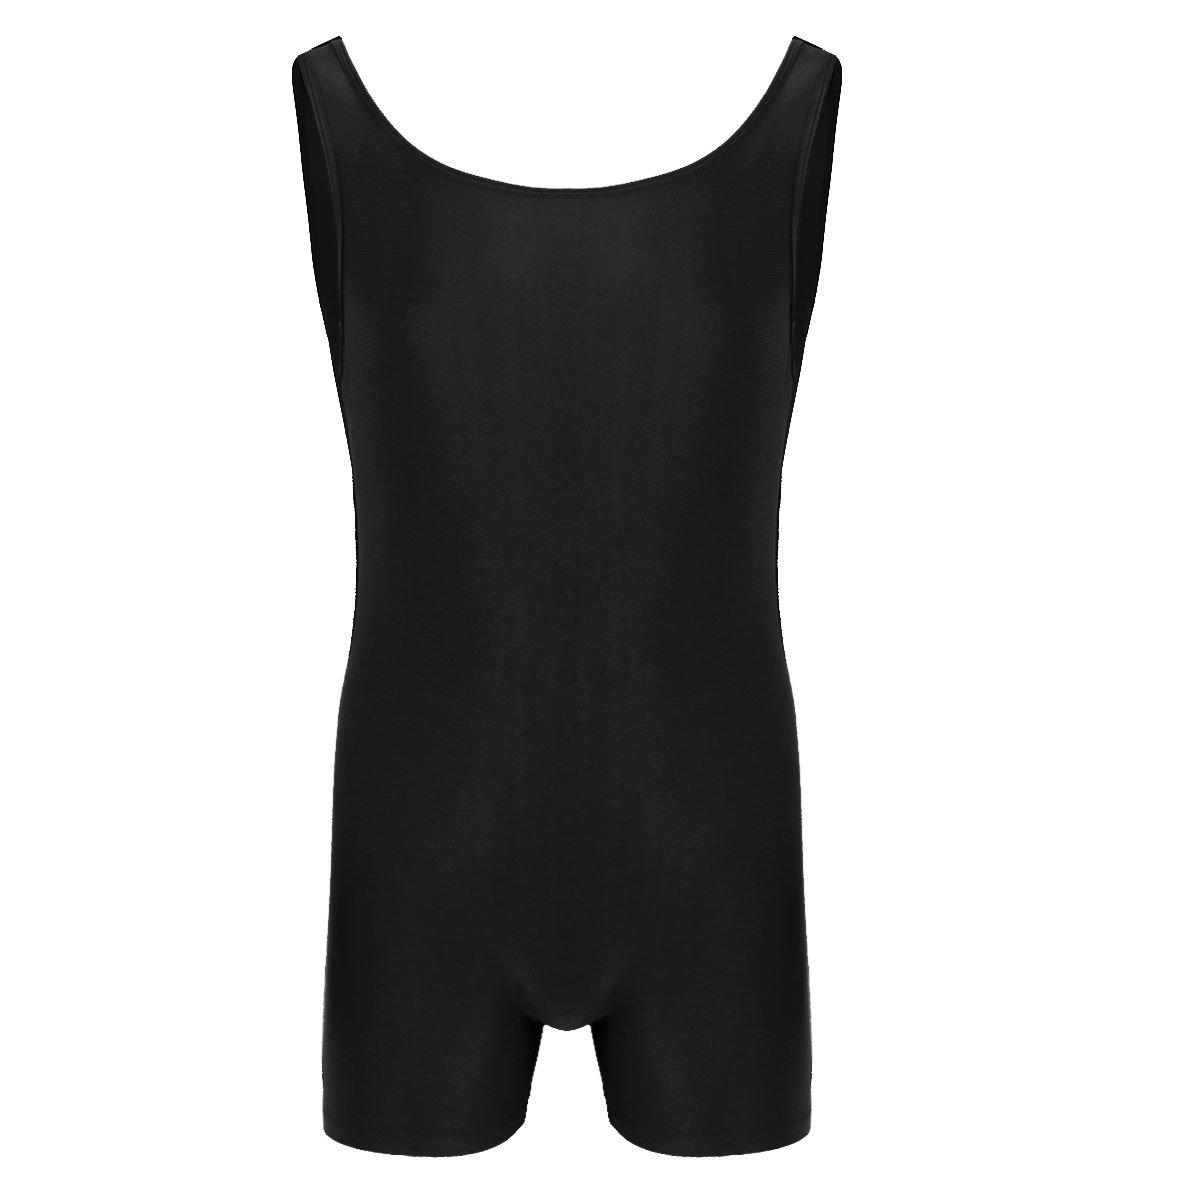 ACSUSS Men's Sleeveless One Piece Bodysuit Stretchy Sports Leotard Underwear Black X-Large